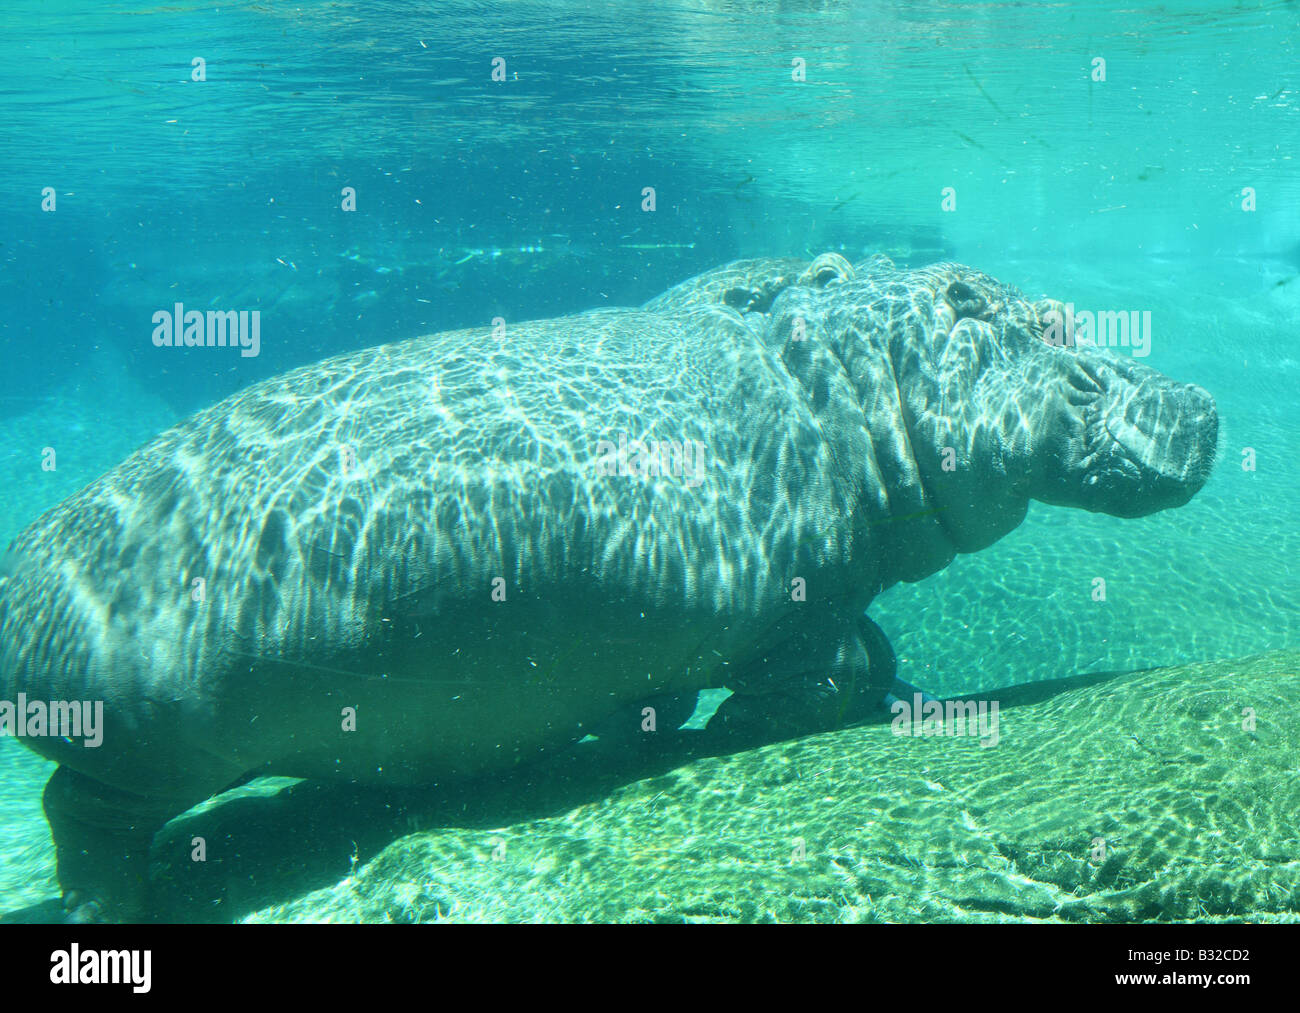 Ippopotamo ippopotamo underwater Immagini Stock